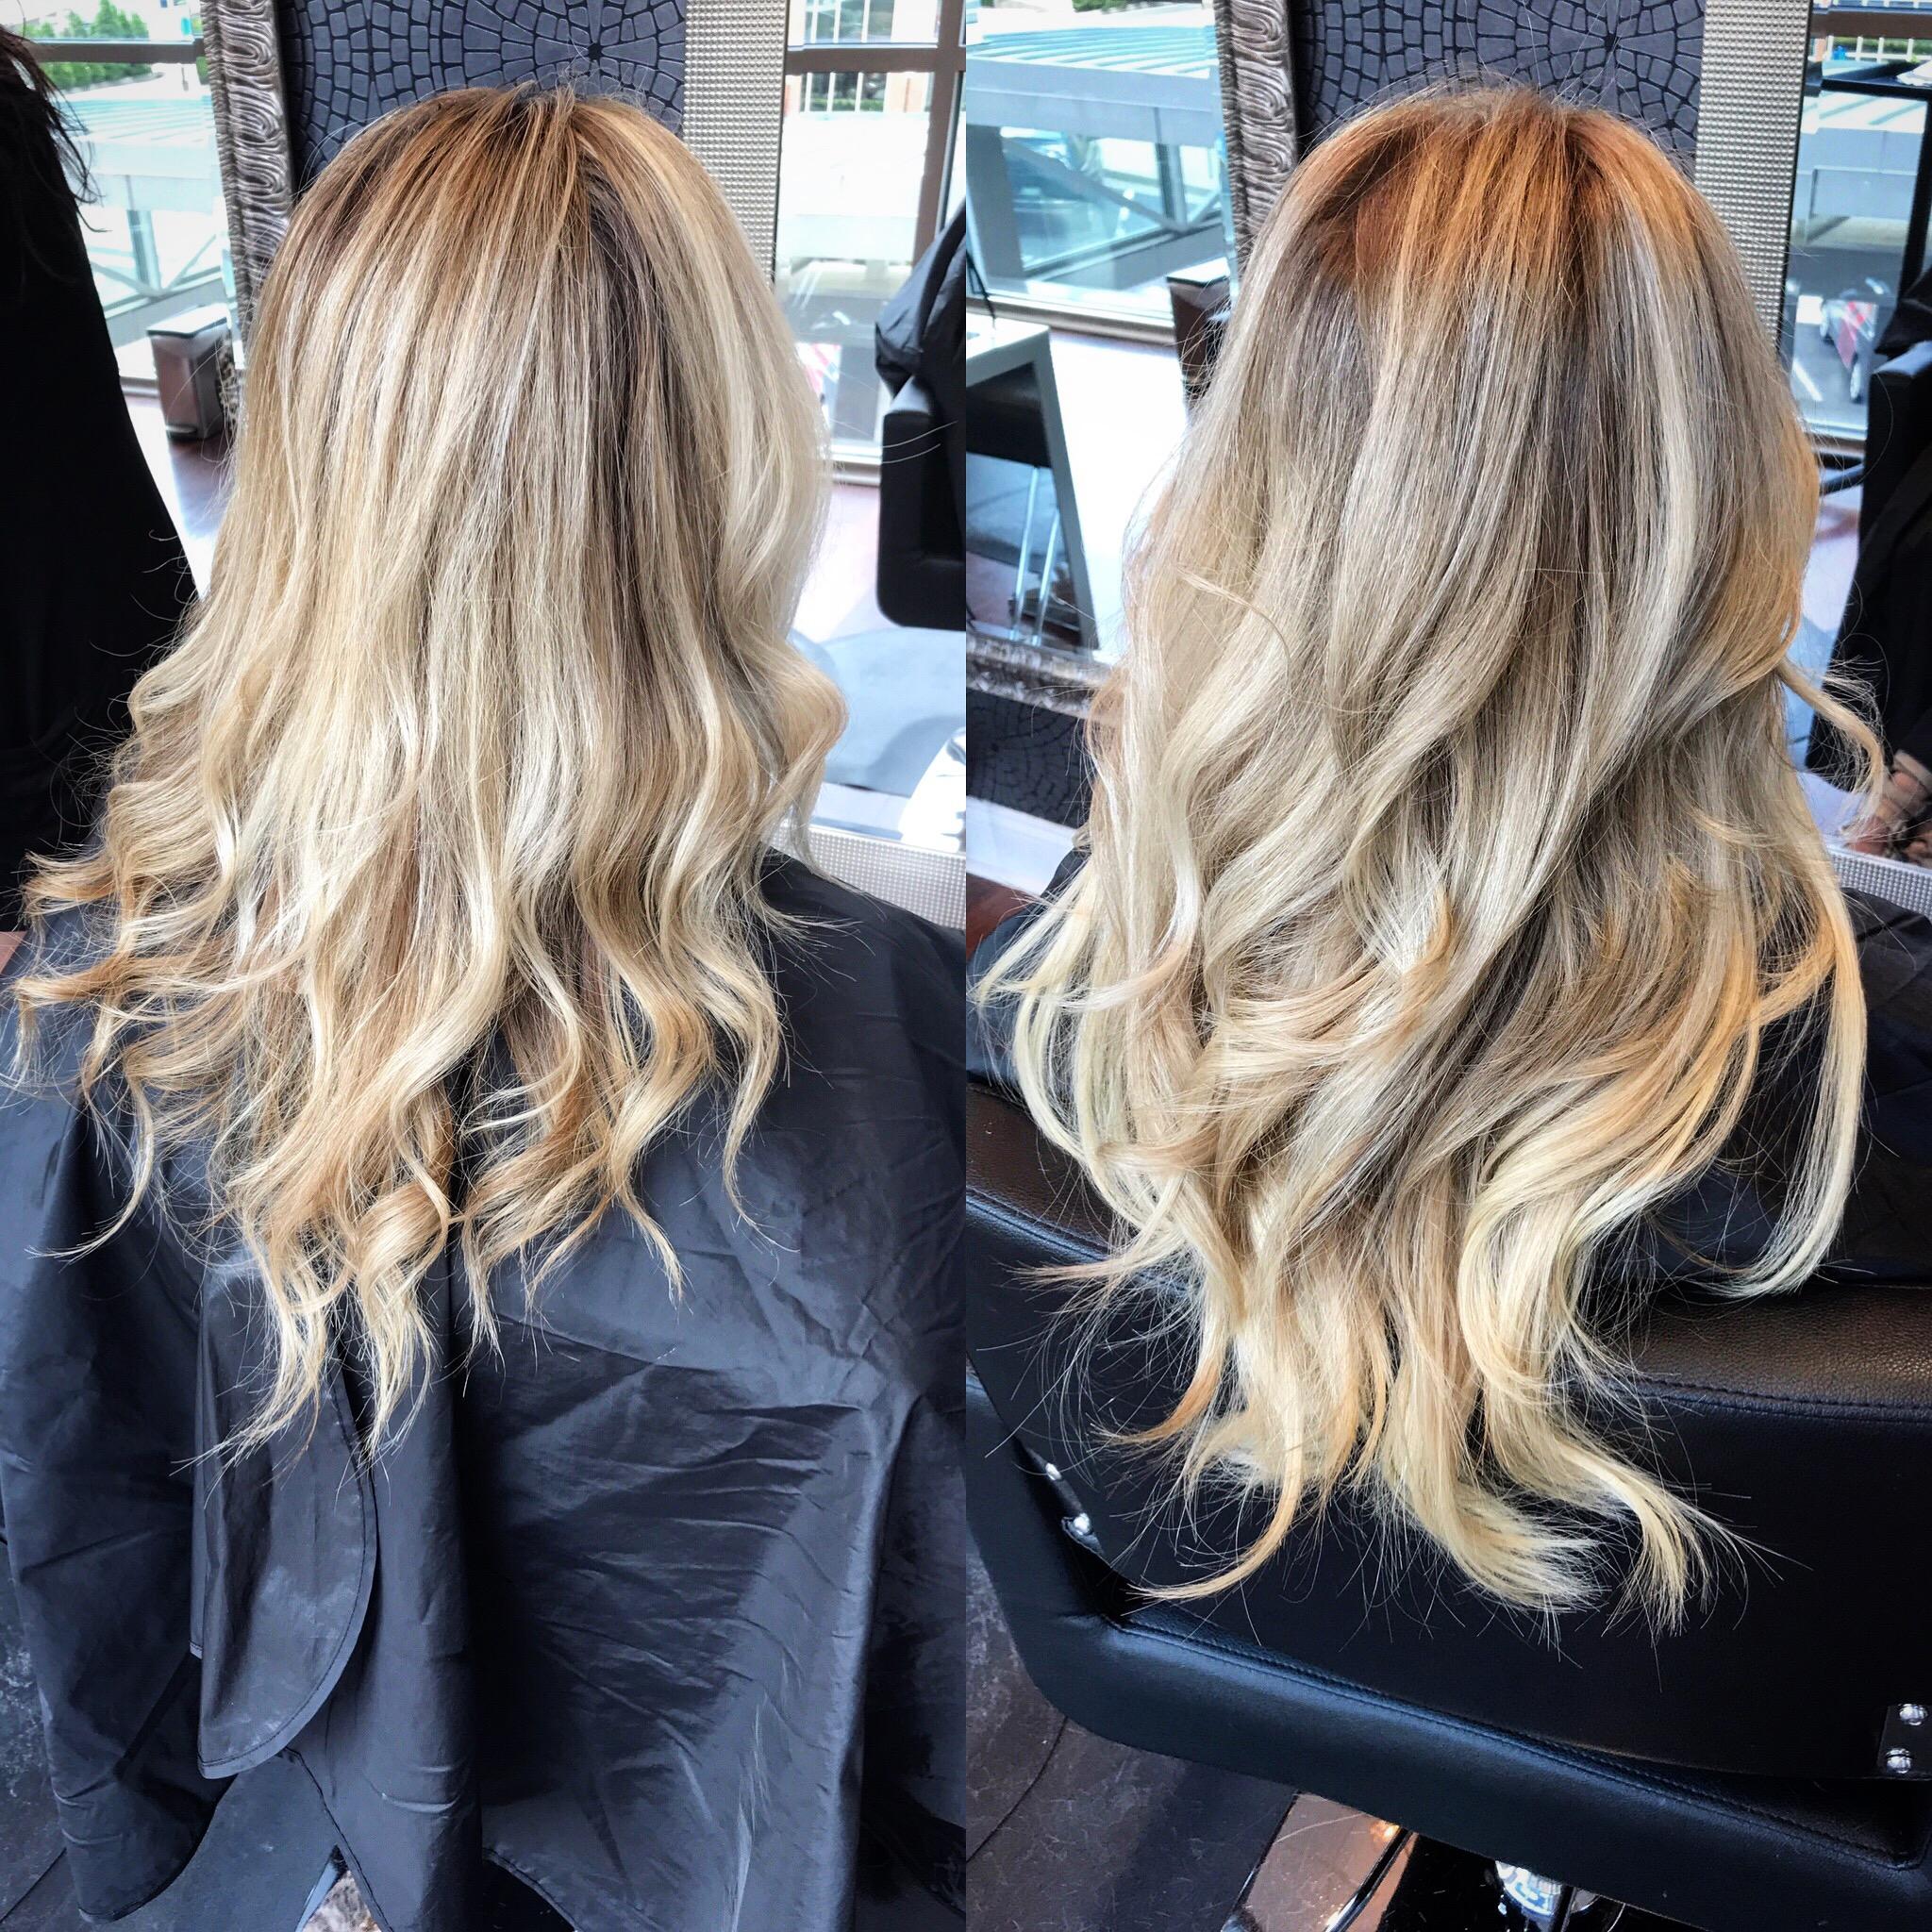 Hair Services Olexa Salon Spa